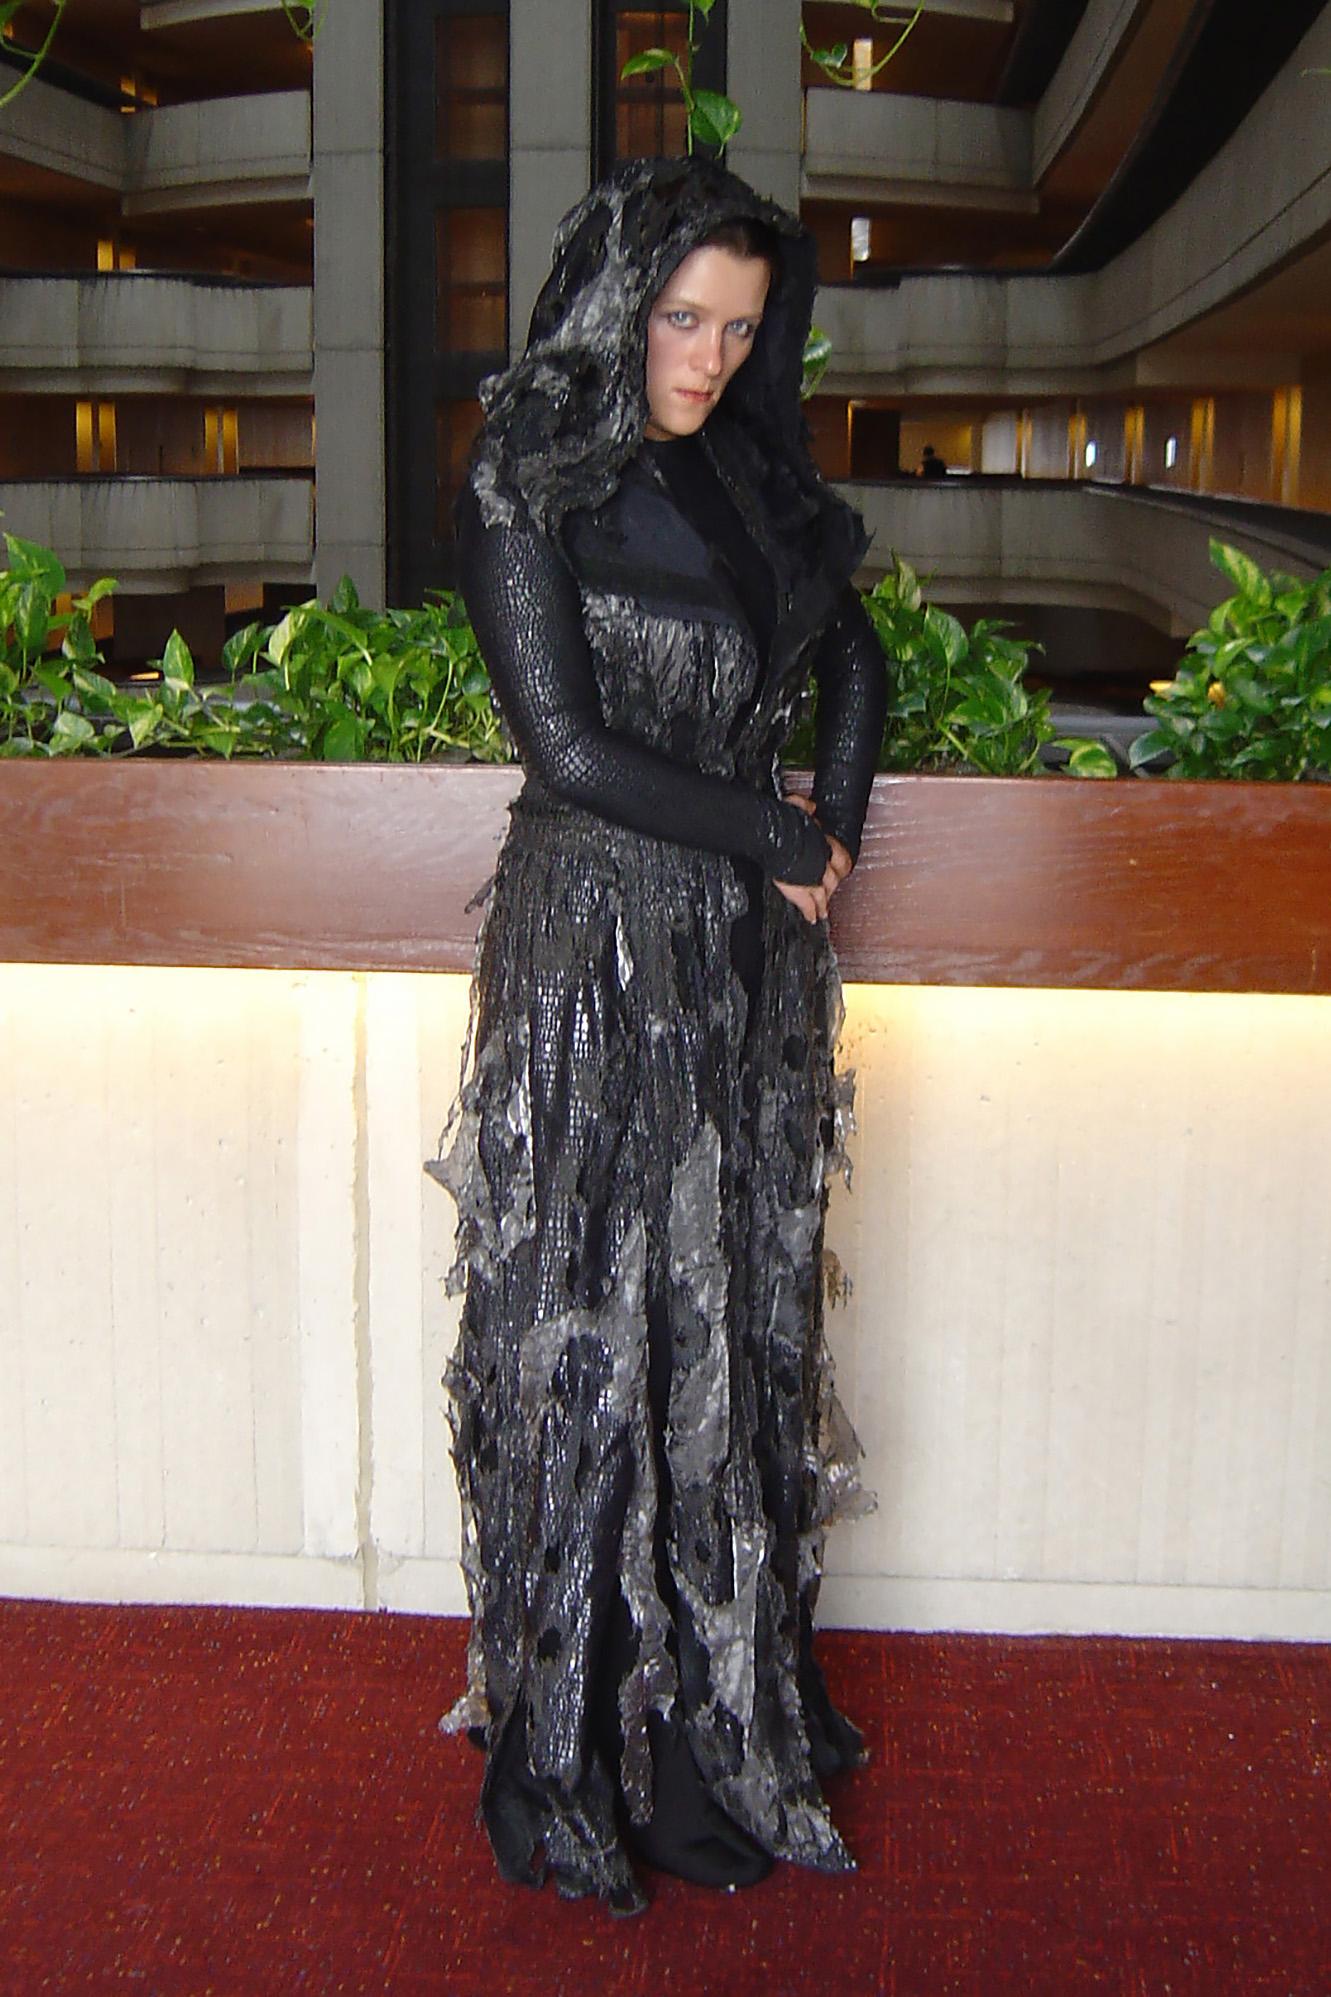 Female Necromonger Convert Costume (DragonCon 2009)